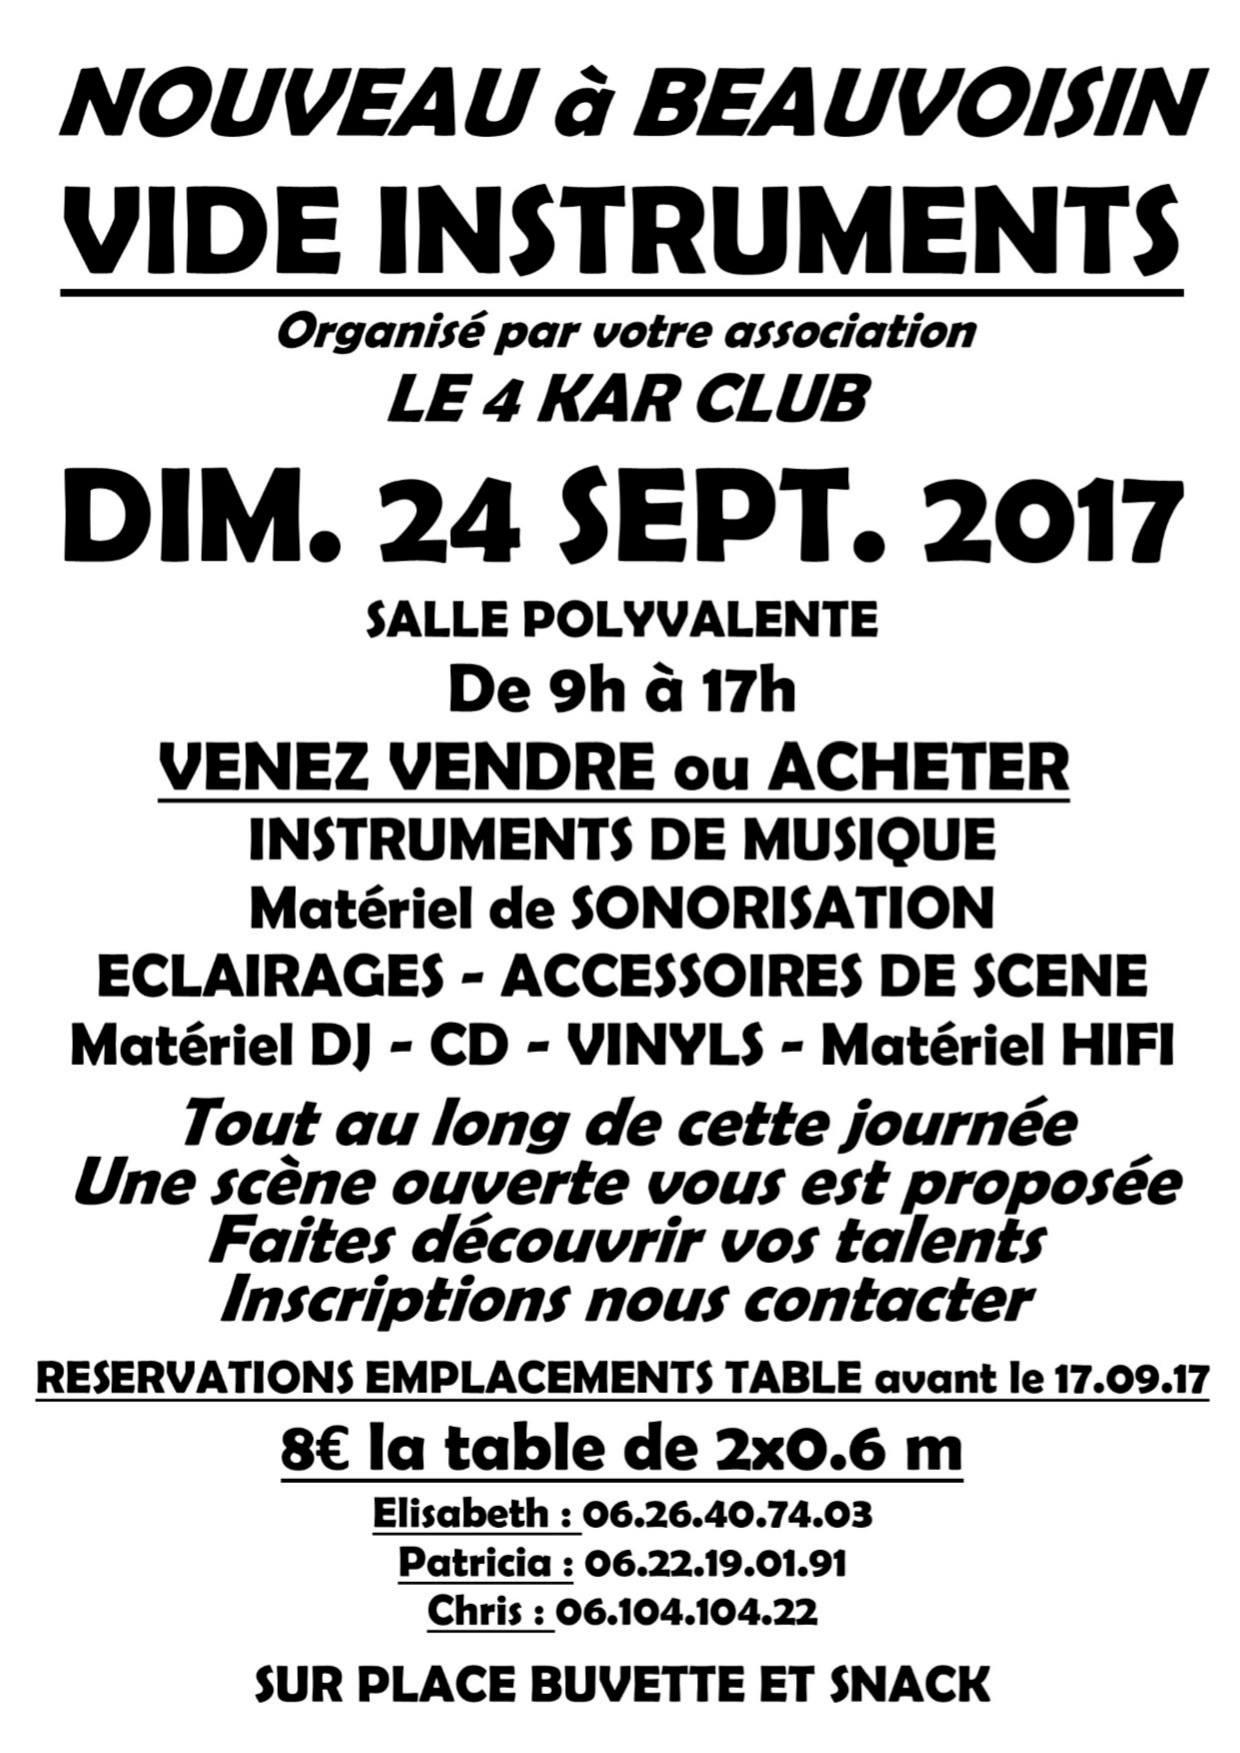 Vide instruments @ Salle polyvalente à Beauvoisin